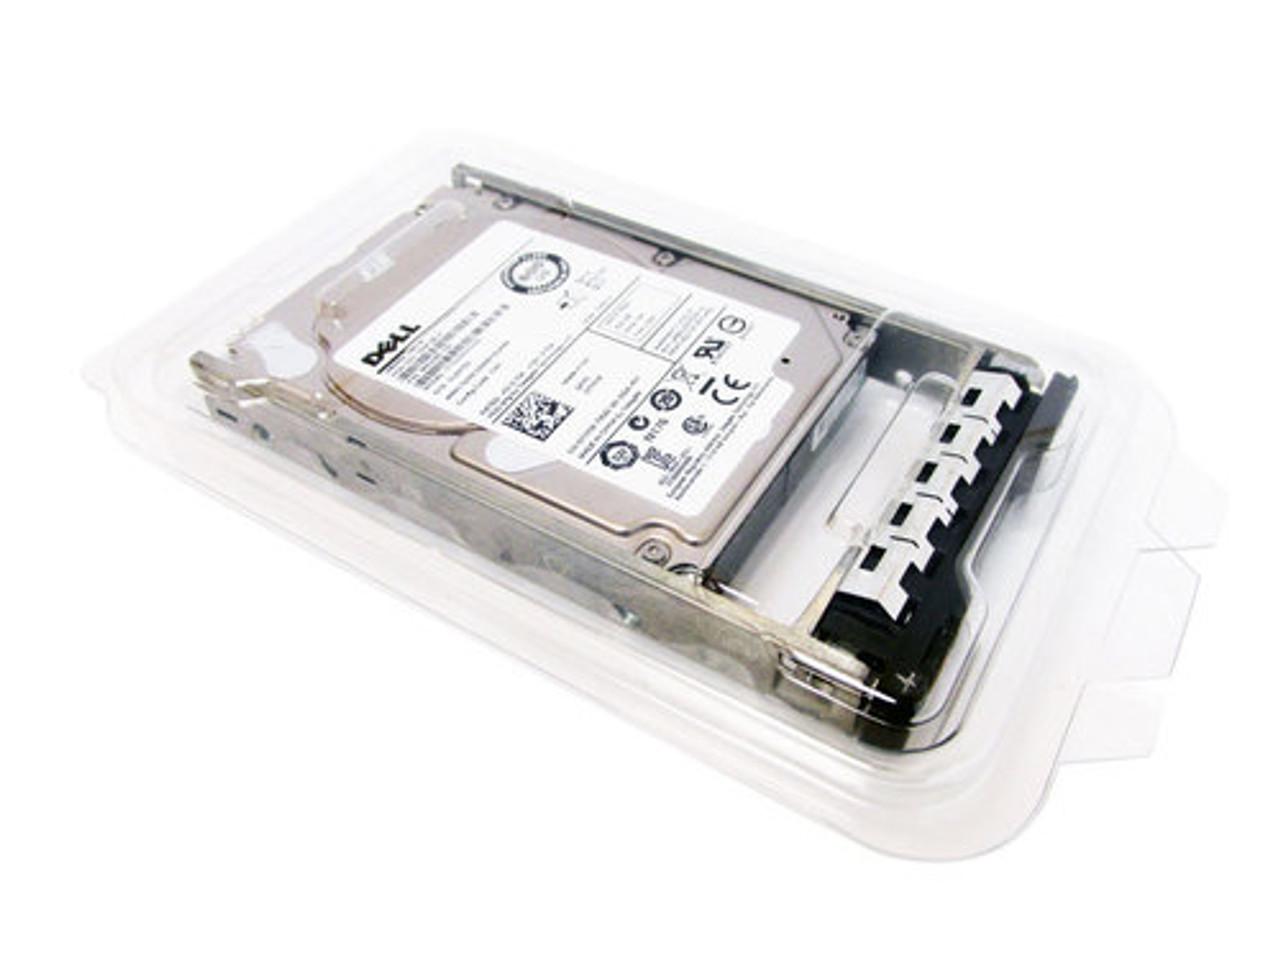 Dell PowerEdge R900 Hot Swap 300GB 10K SAS Hard Drive 1 Year Warranty